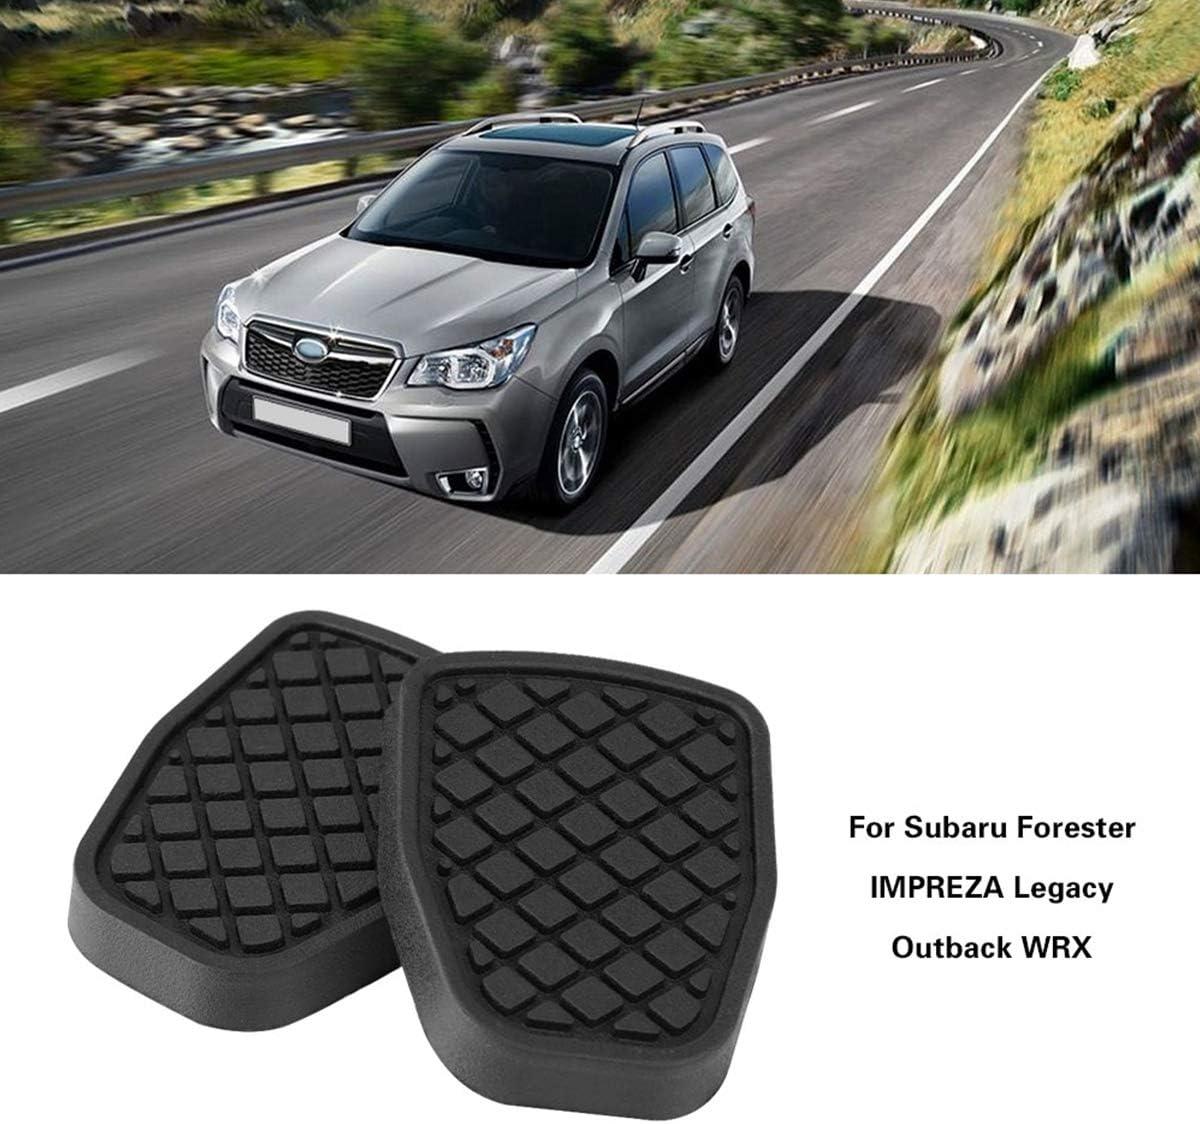 SANON Auto Pedal Ein Paar Bremskupplung Pedal Gummipolster f/ür Subaru Forester Impreza Legacy Outback Wrx